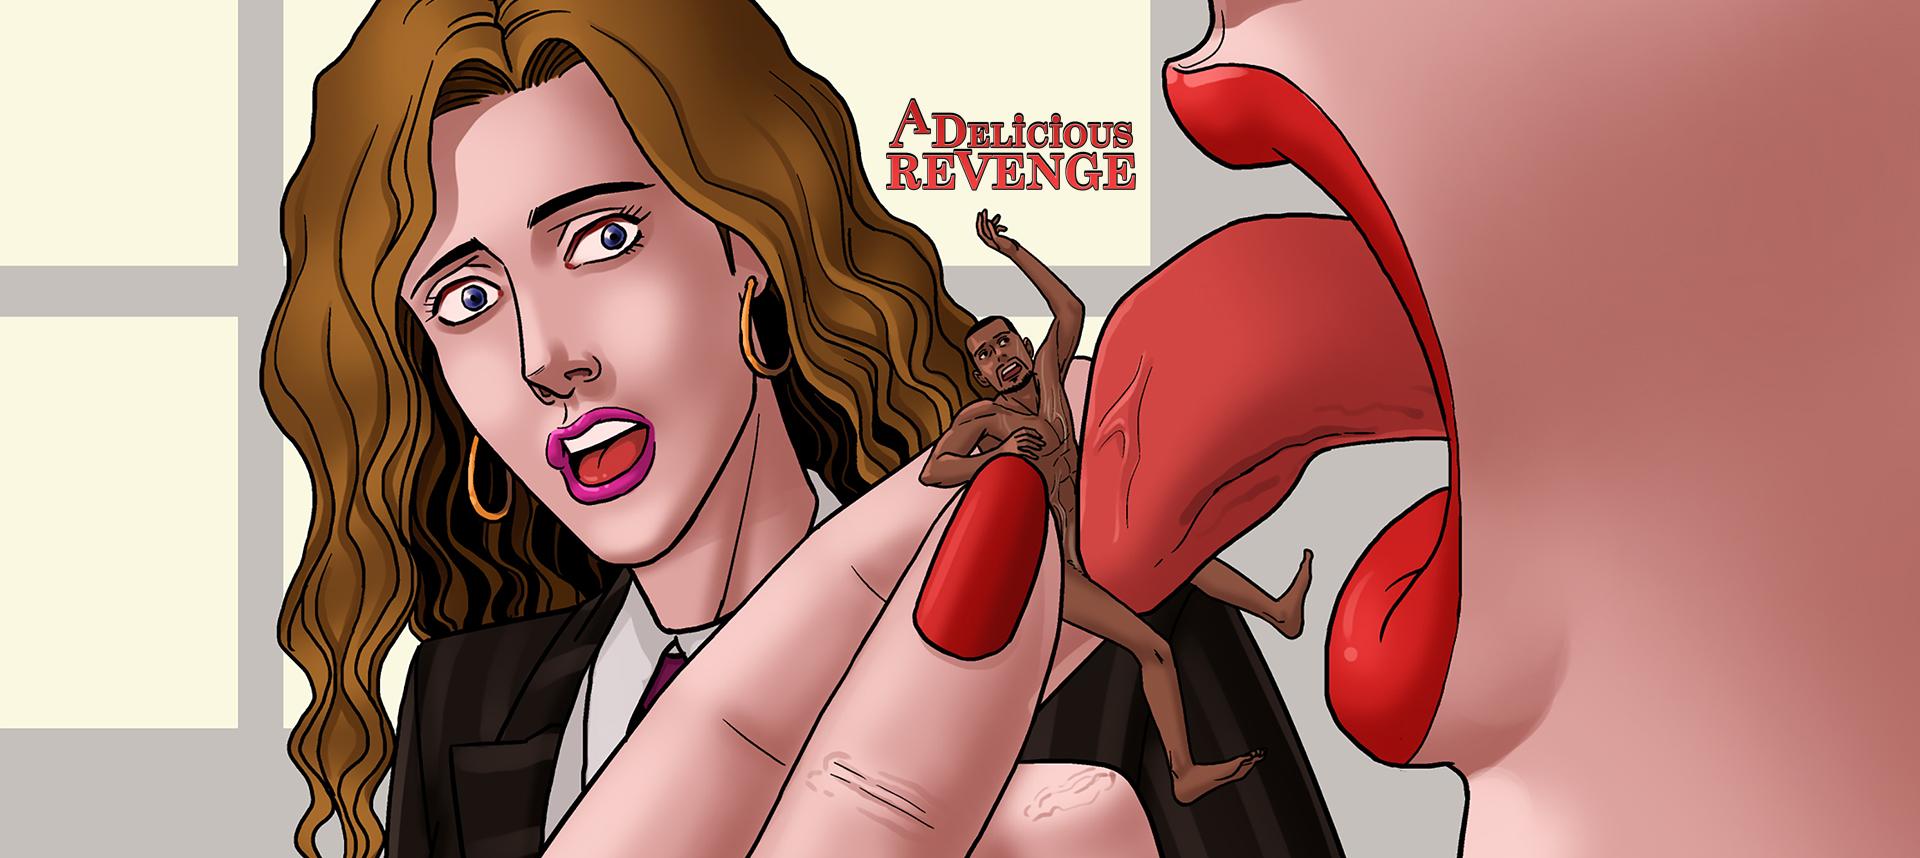 A-Delicious-Revenge_01-SLIDEa